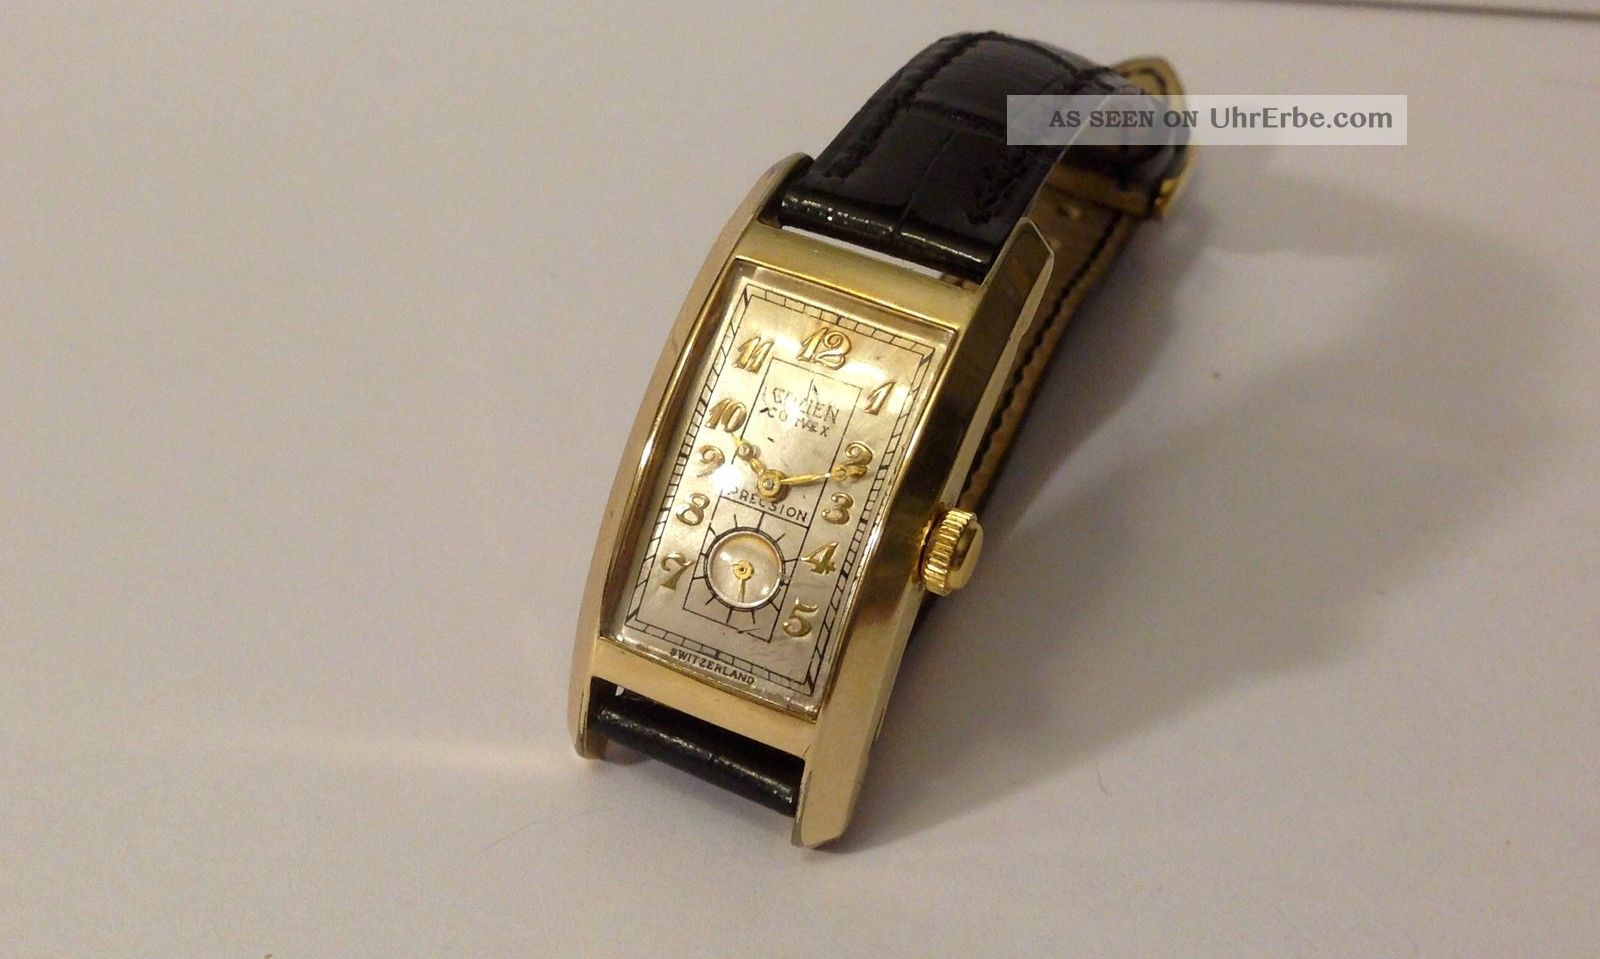 Gruen Sammlerstück Curvex Precision Handaufzug 1930er Jahre Armbanduhren Bild